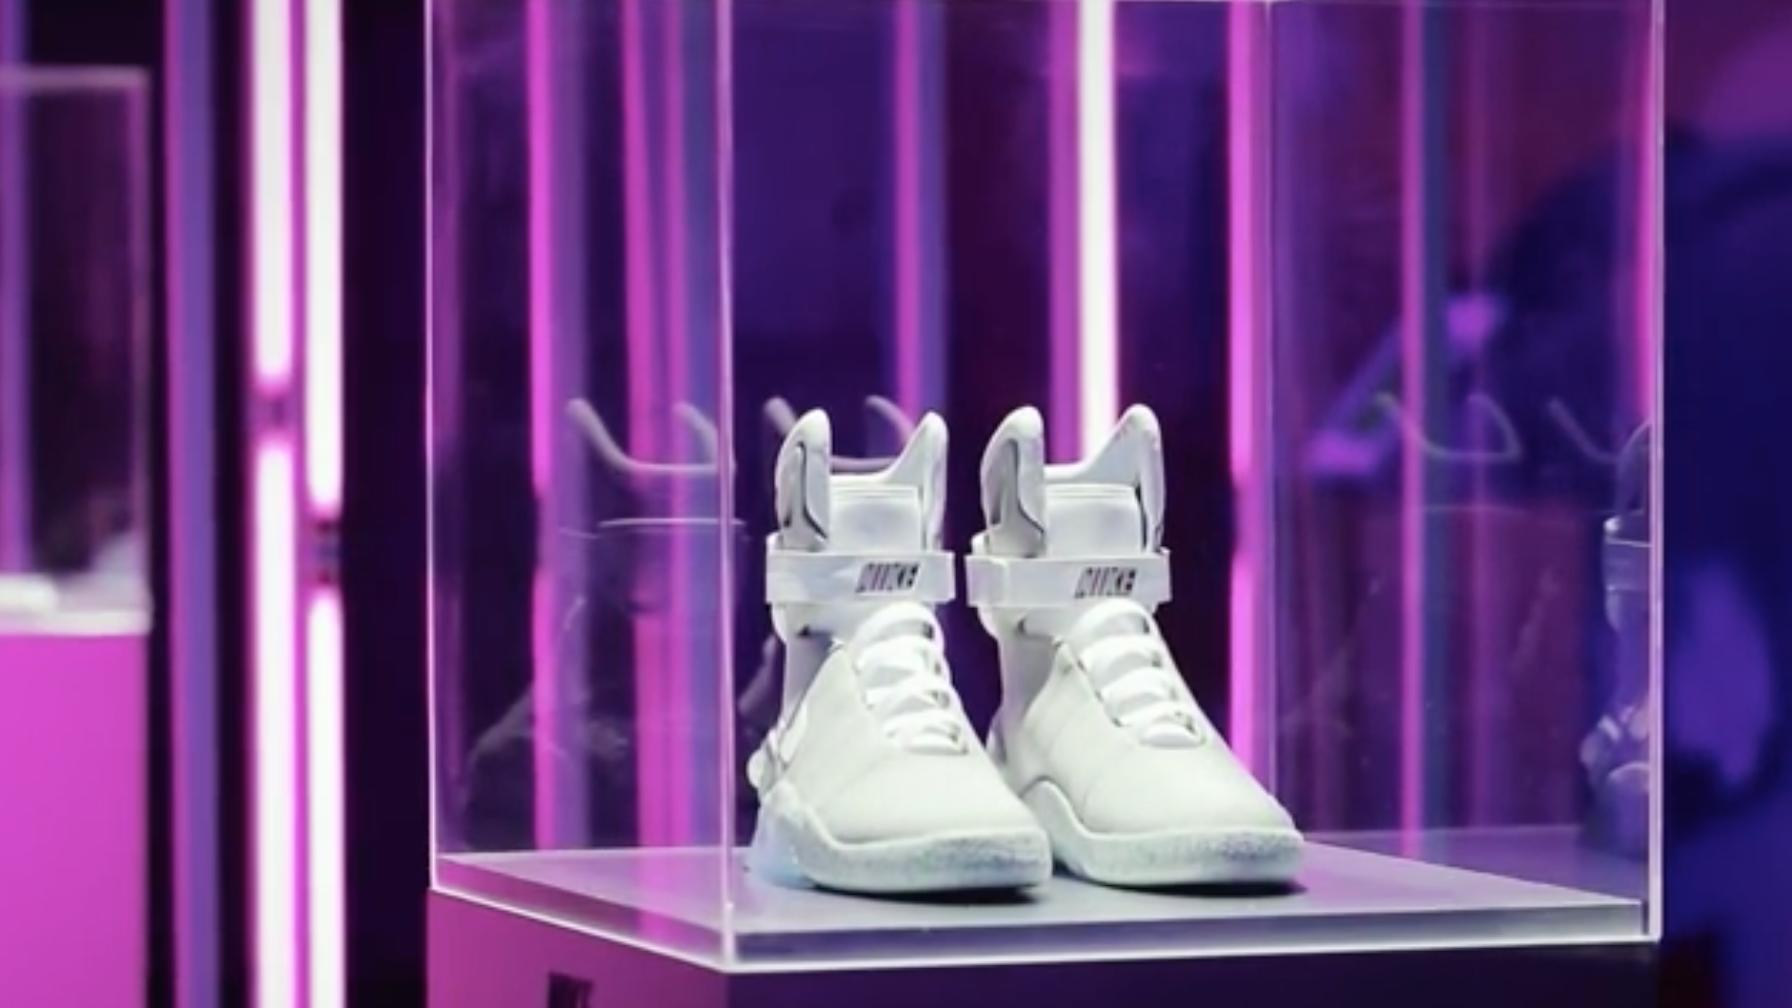 The Nike Mag sneaker raffle raised $6